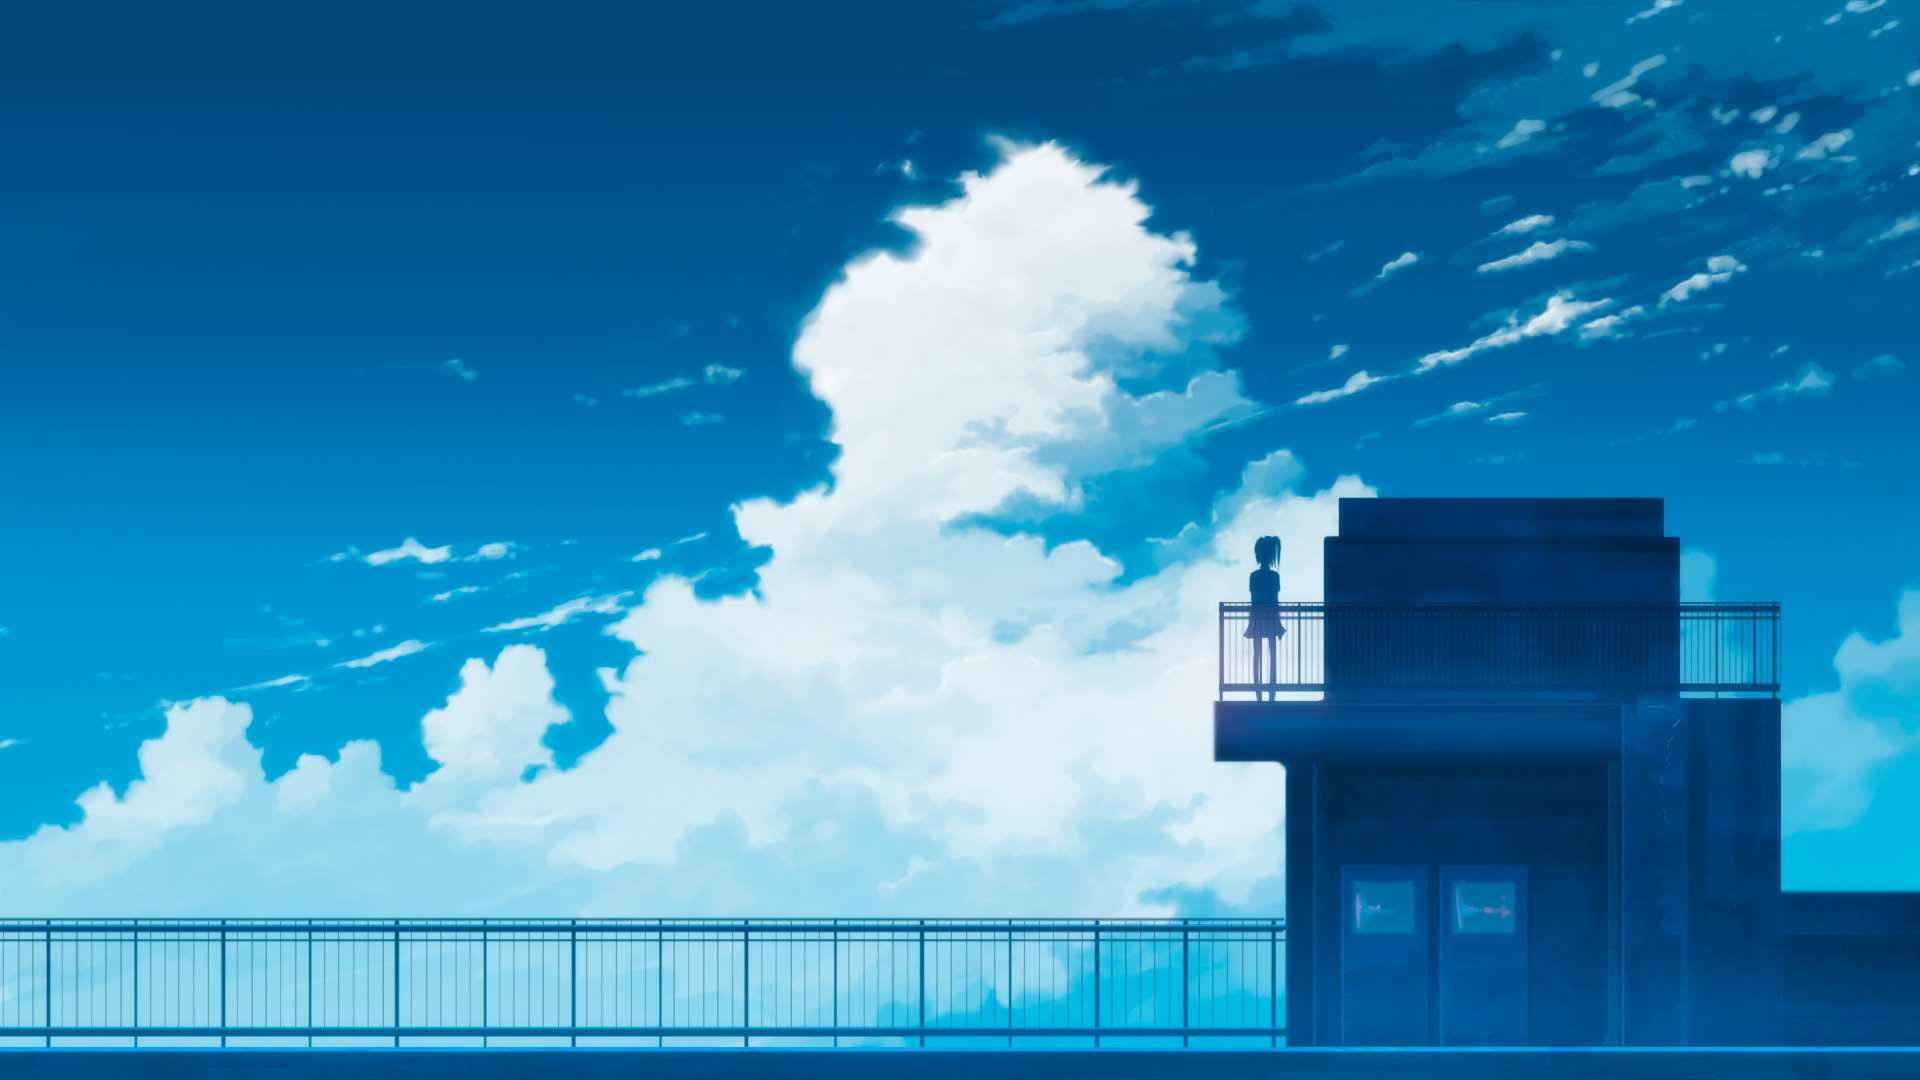 Sad Boy And Girl Love Wallpaper Hd Girl Standing Alone Artwork Hd Anime 4k Wallpapers